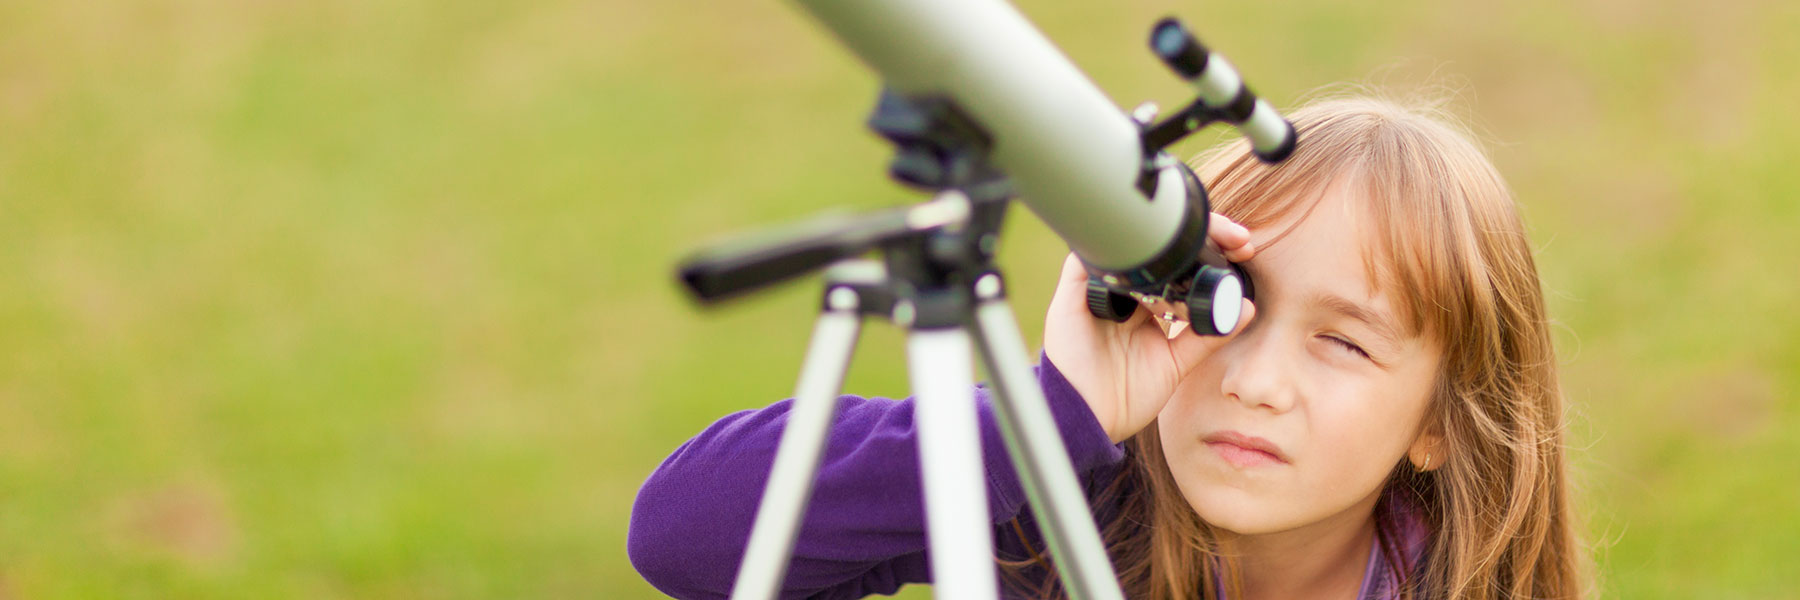 young girl looking through telescope